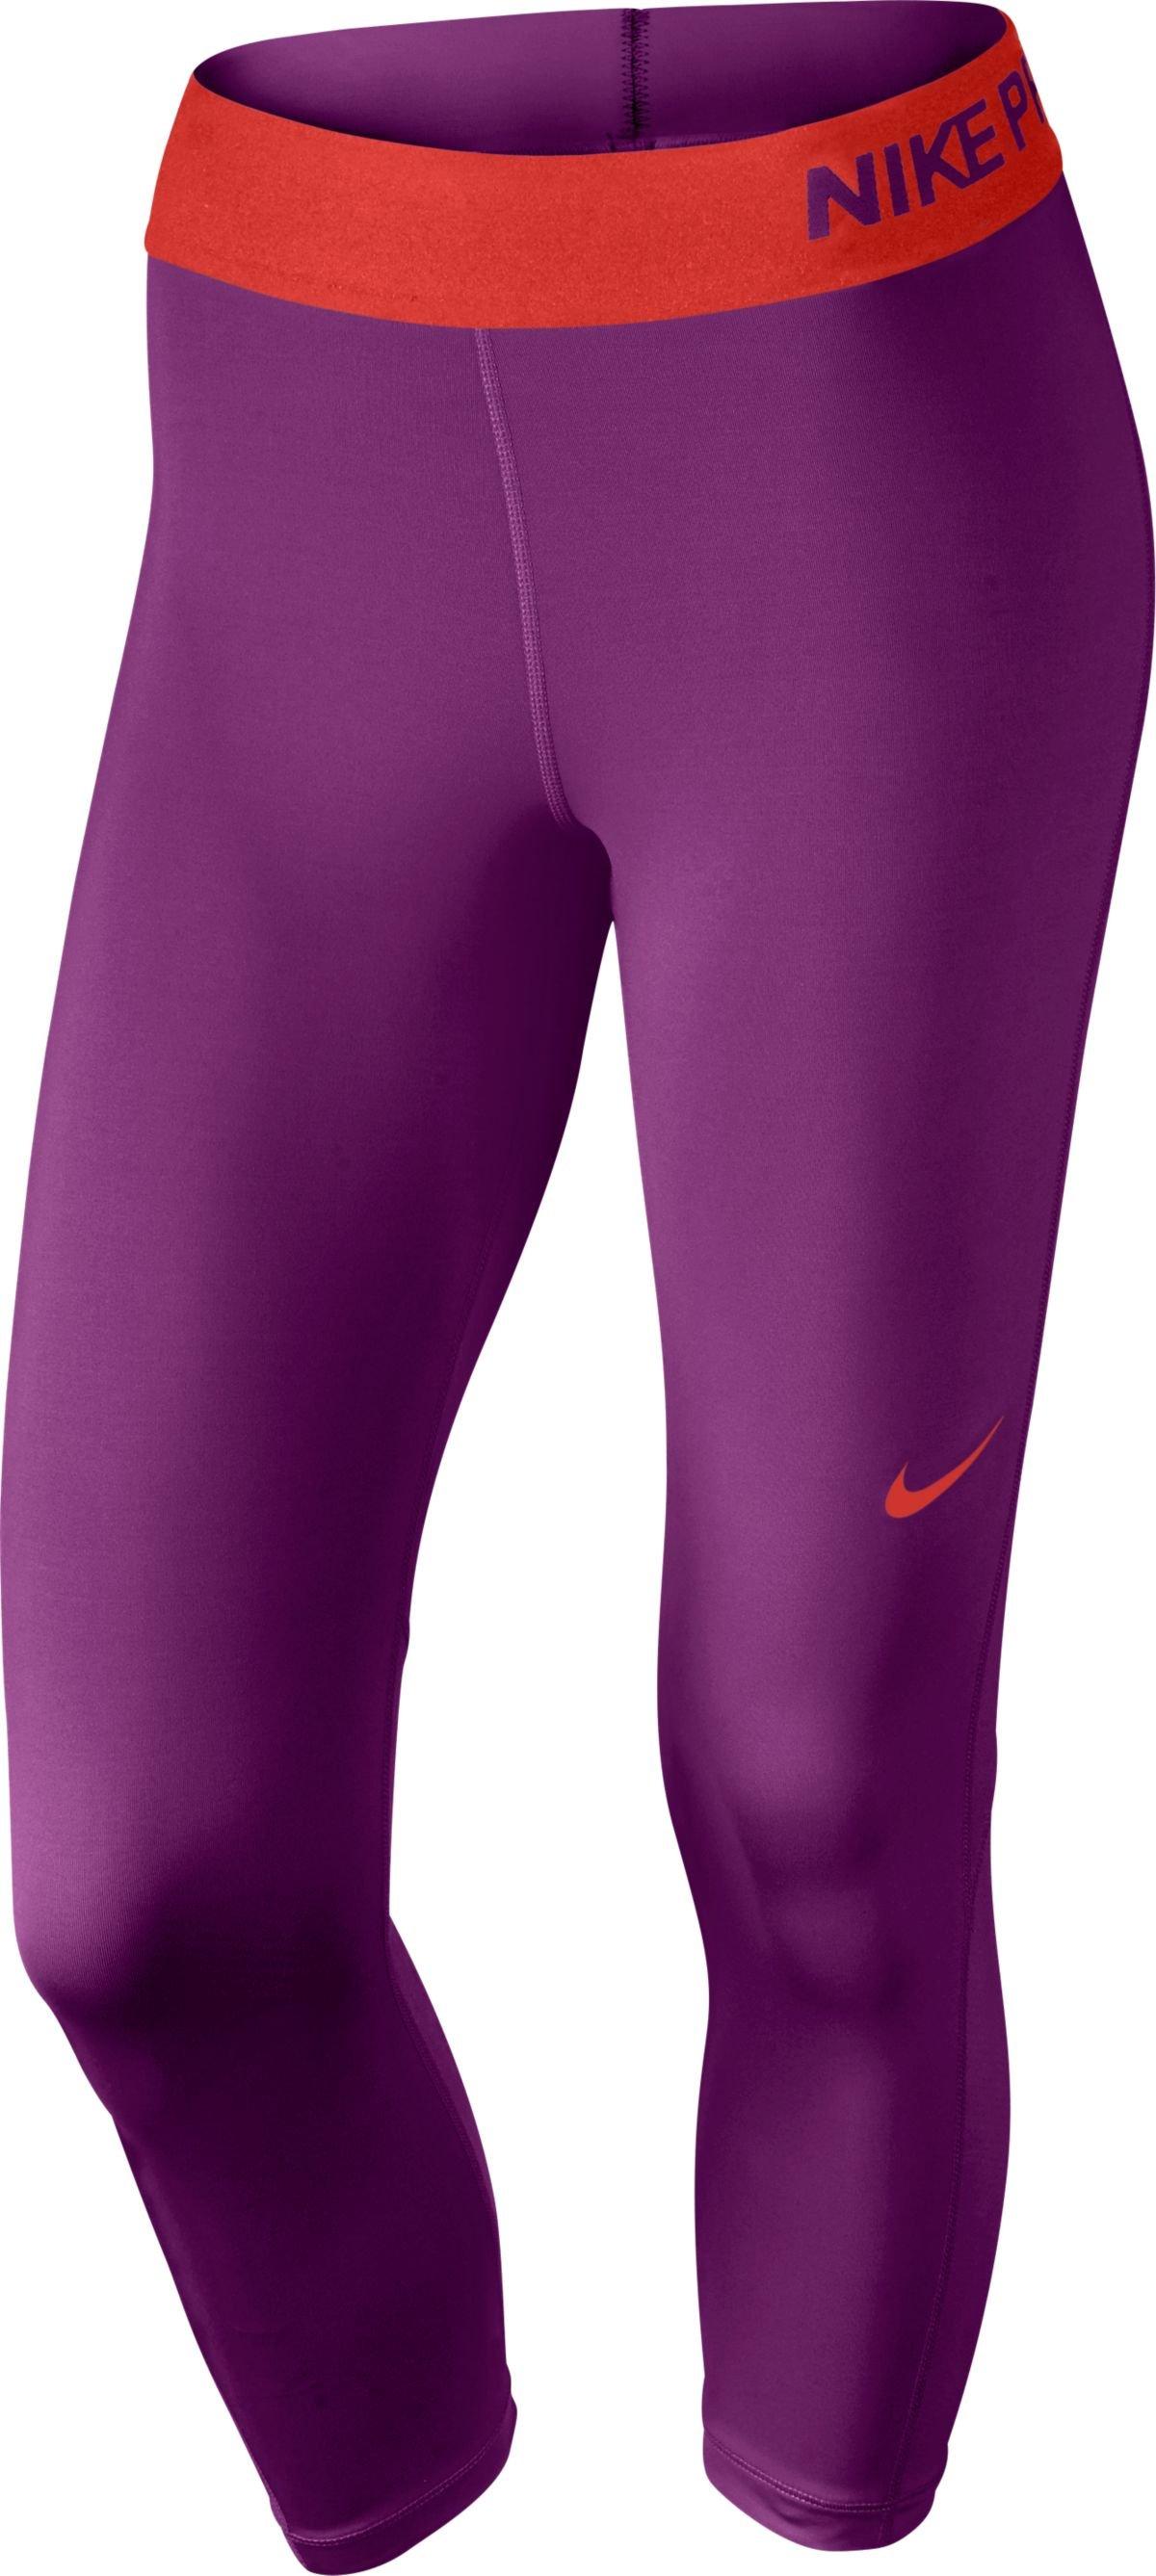 Kalhoty 3/4 Nike PRO COOL CAPRI